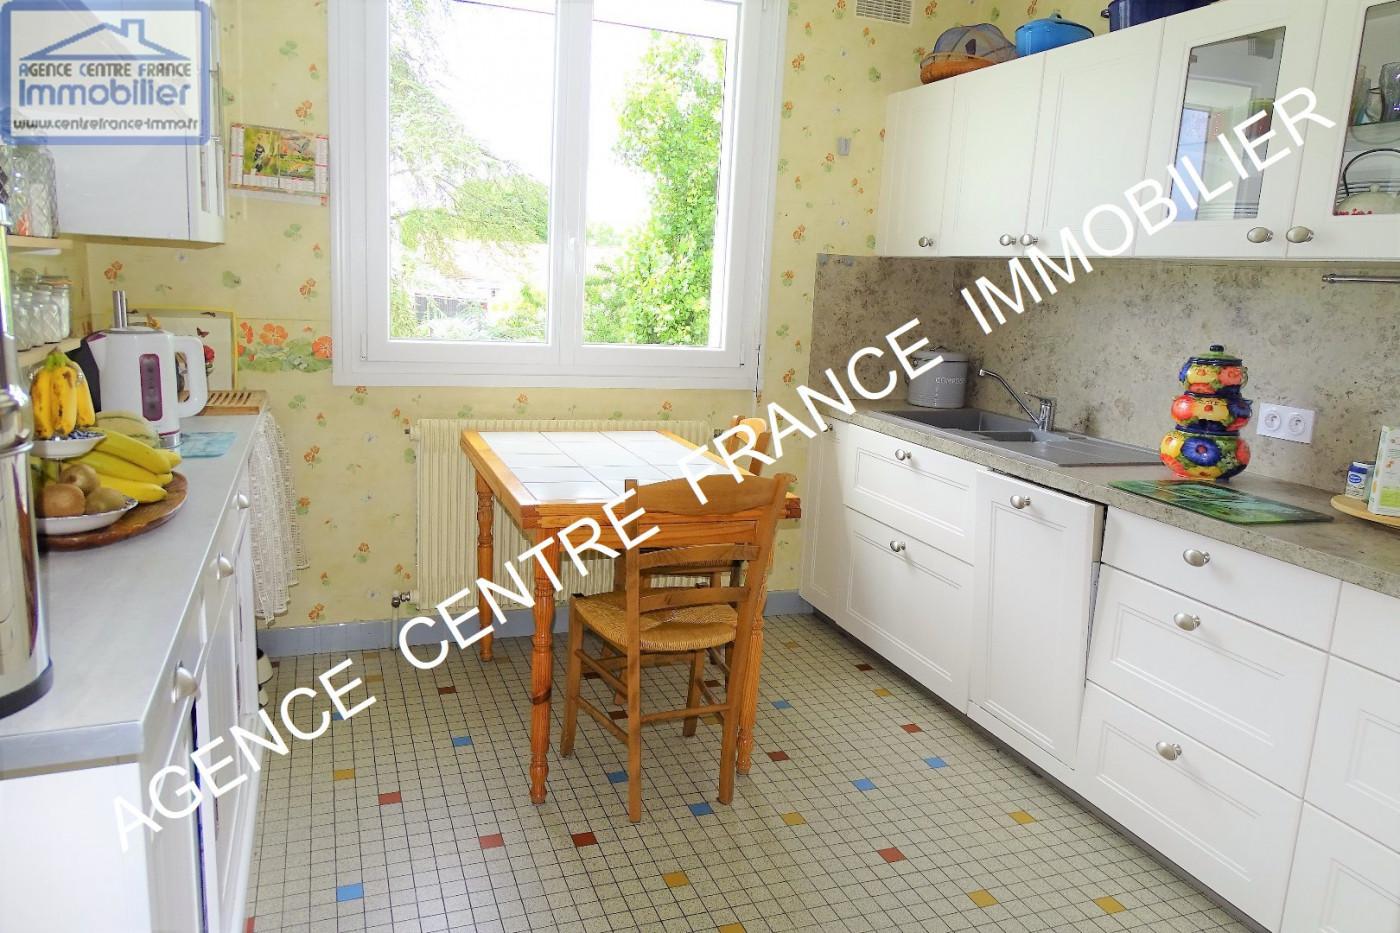 A vendre  Bourges   Réf 030011521 - Agence centre france immobilier